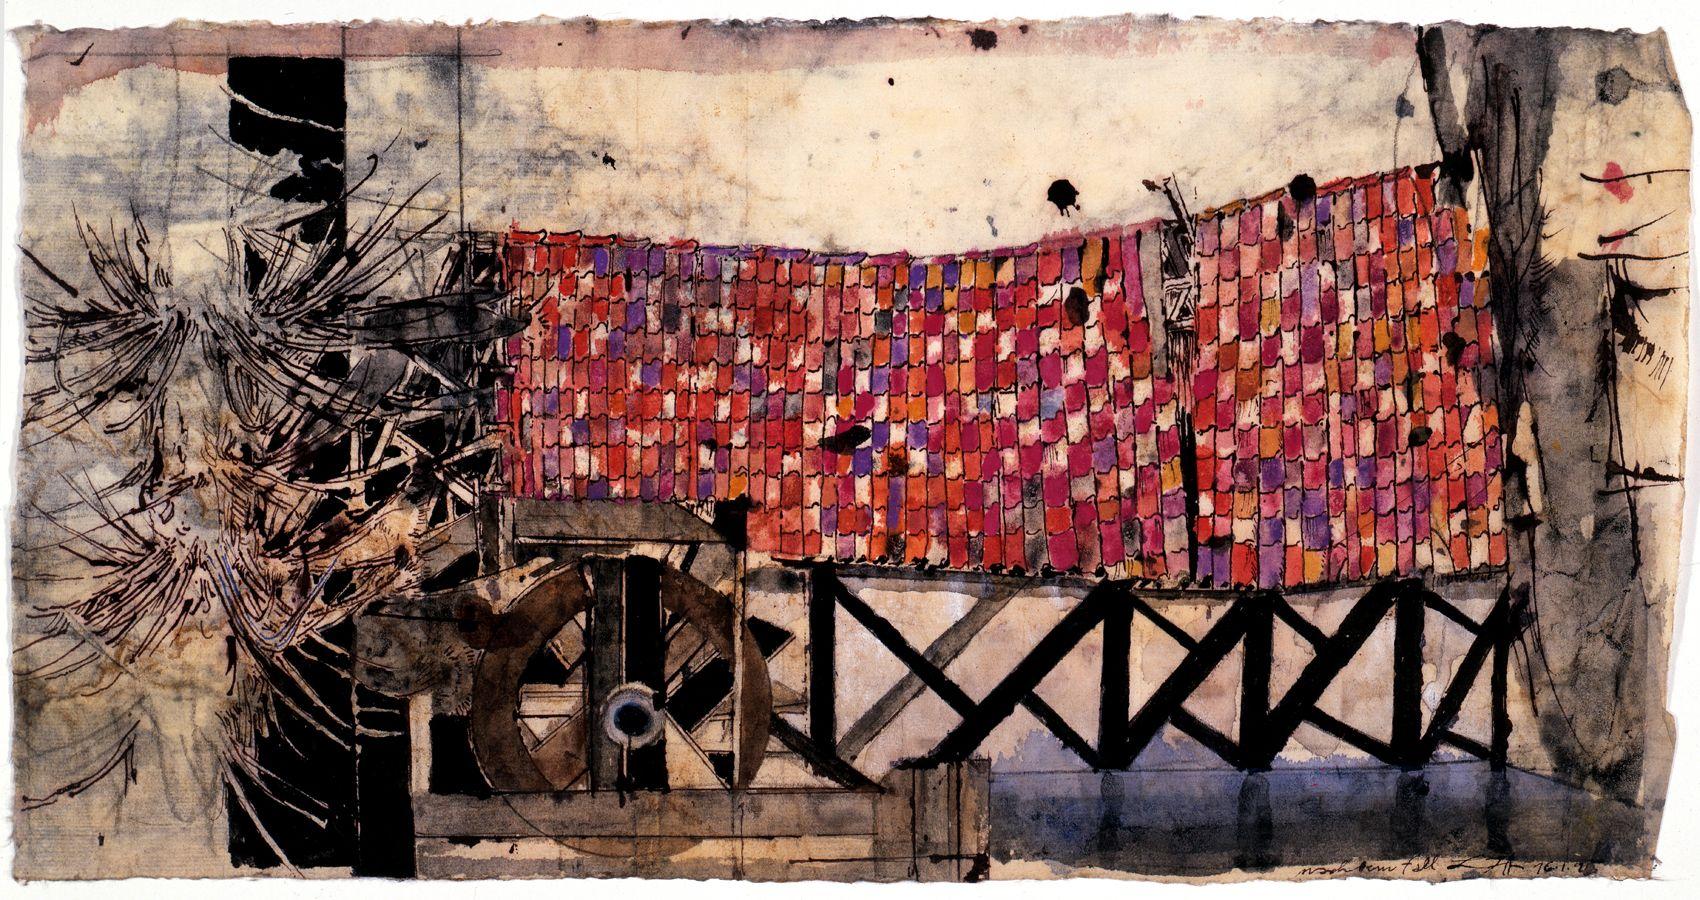 HORST JANSSEN, Landscape Xmas, 16-1-1995